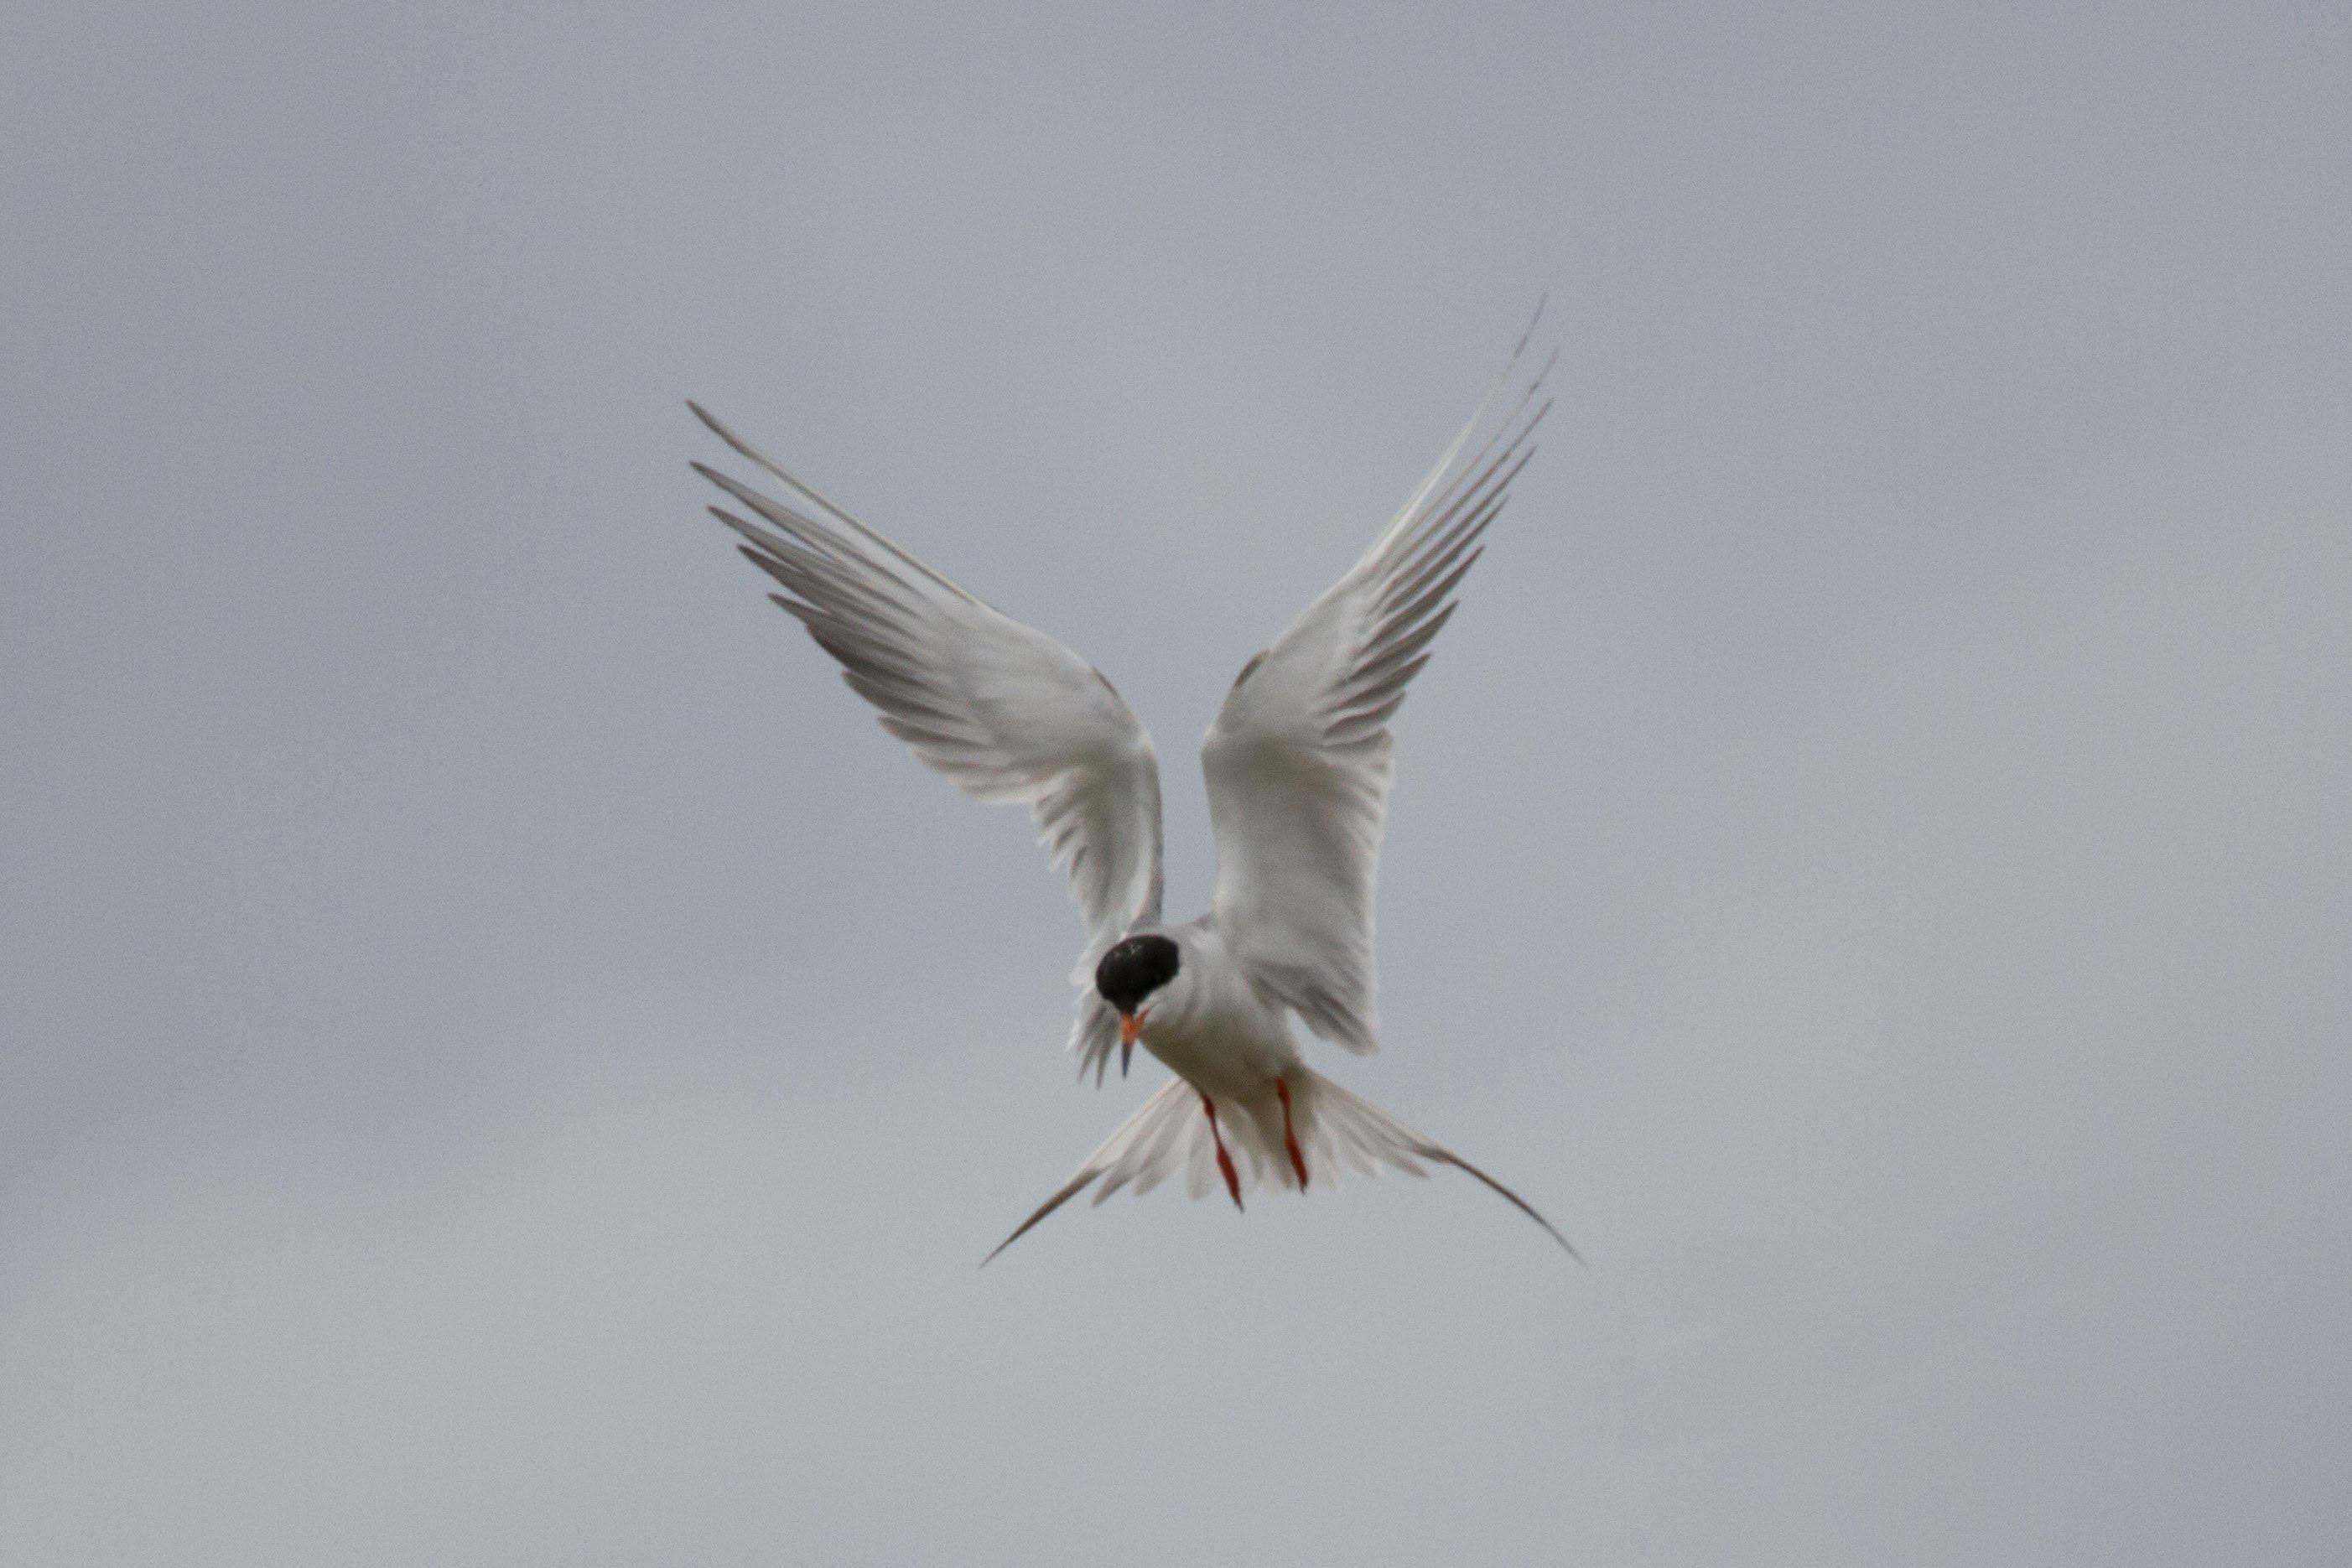 Common Tern Courtesy & © Jose Pacheco, Photographer